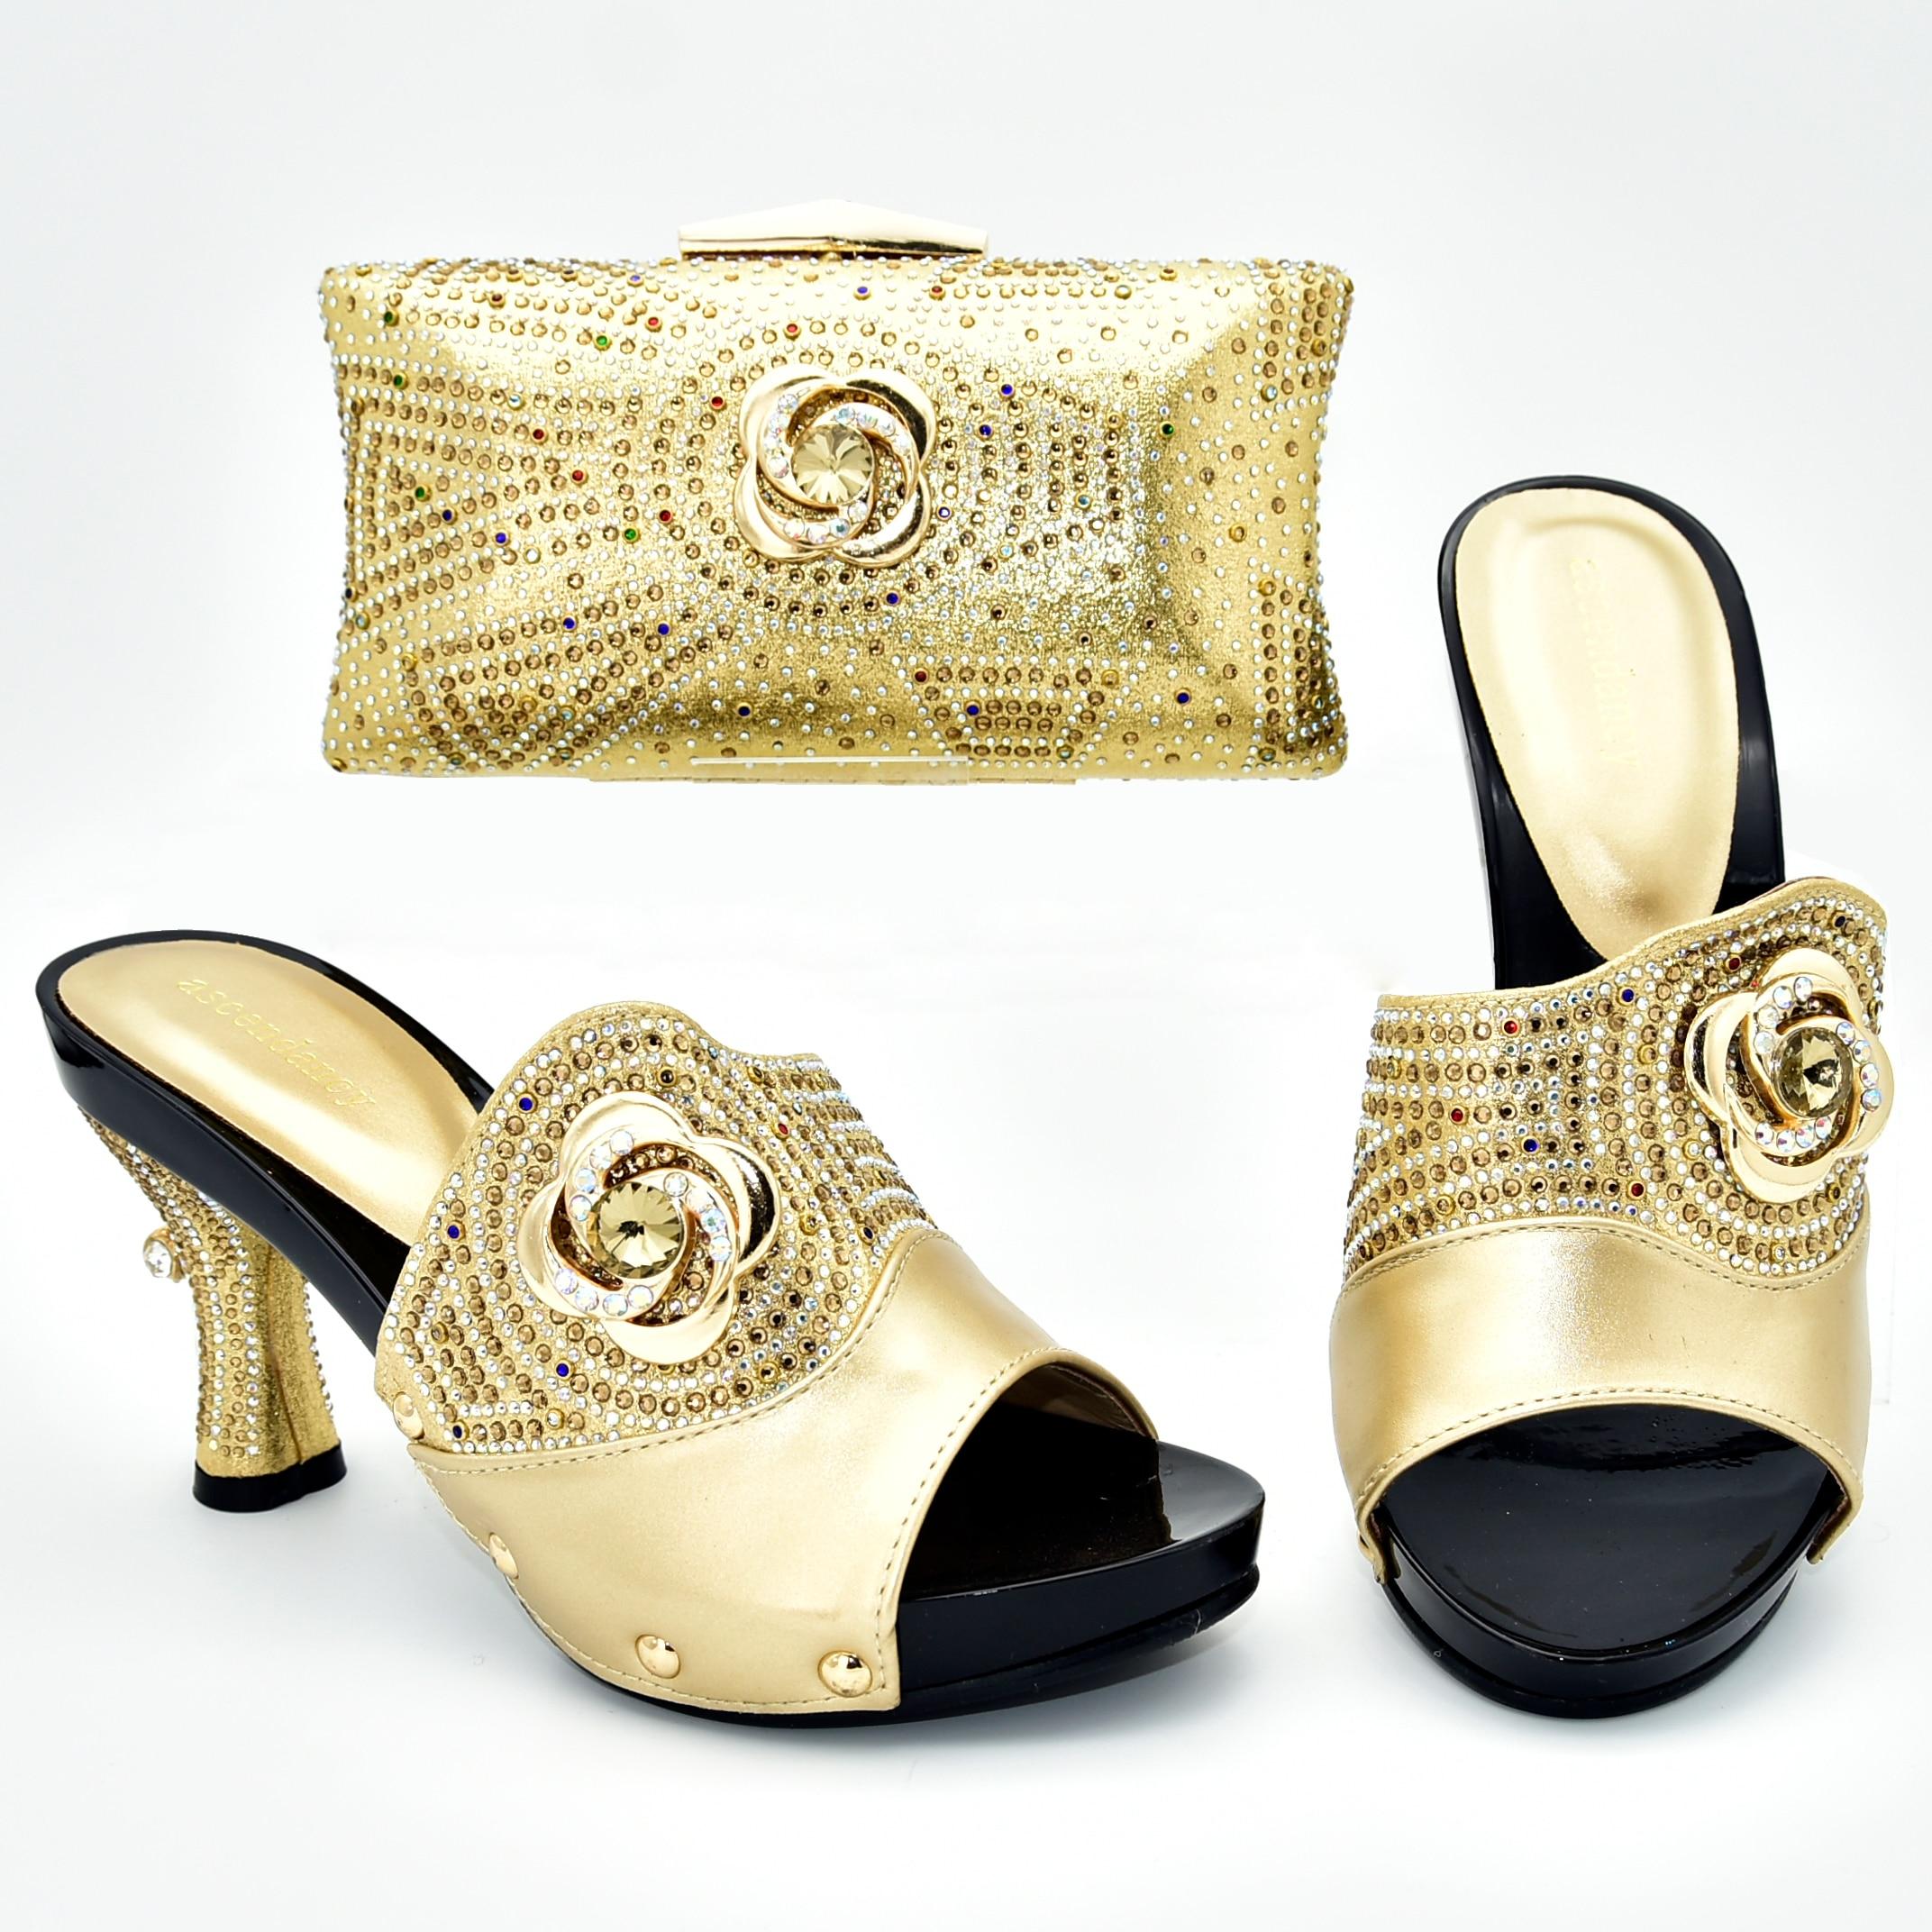 Strass or dame chaussures correspondant sac italie nouveau 2019 design pour africain aso ebi mariage chaussures sacs correspondant SB8396-4